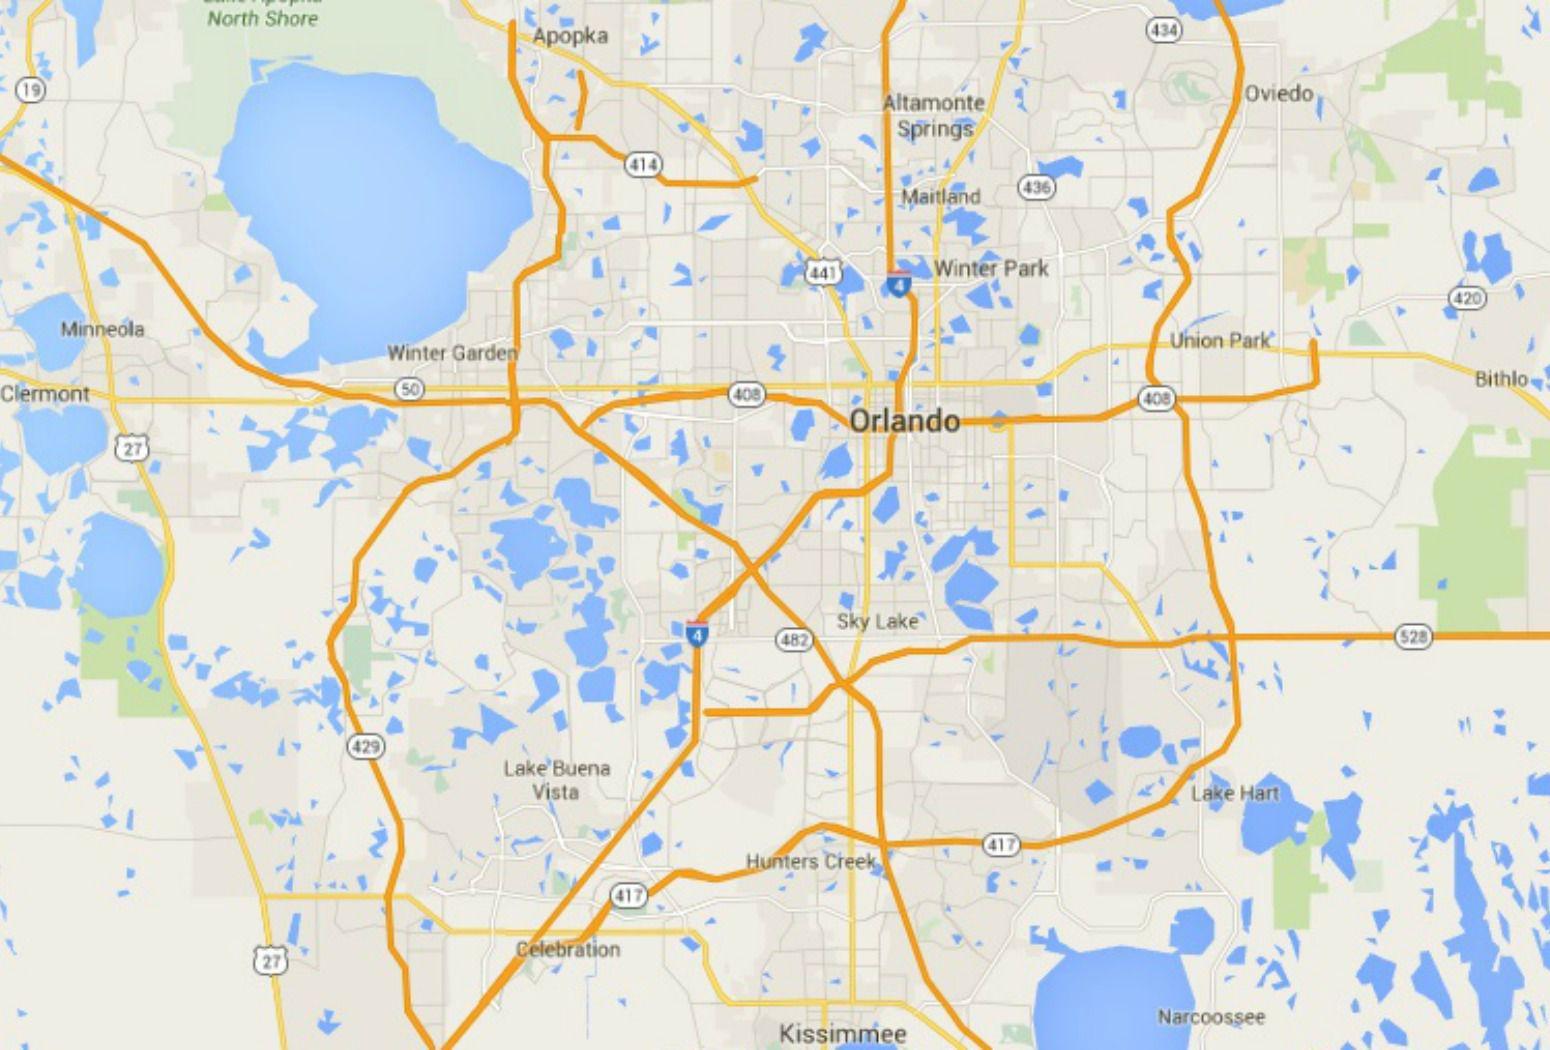 Maps Of Florida: Orlando, Tampa, Miami, Keys, And More - Google Maps Clermont Florida